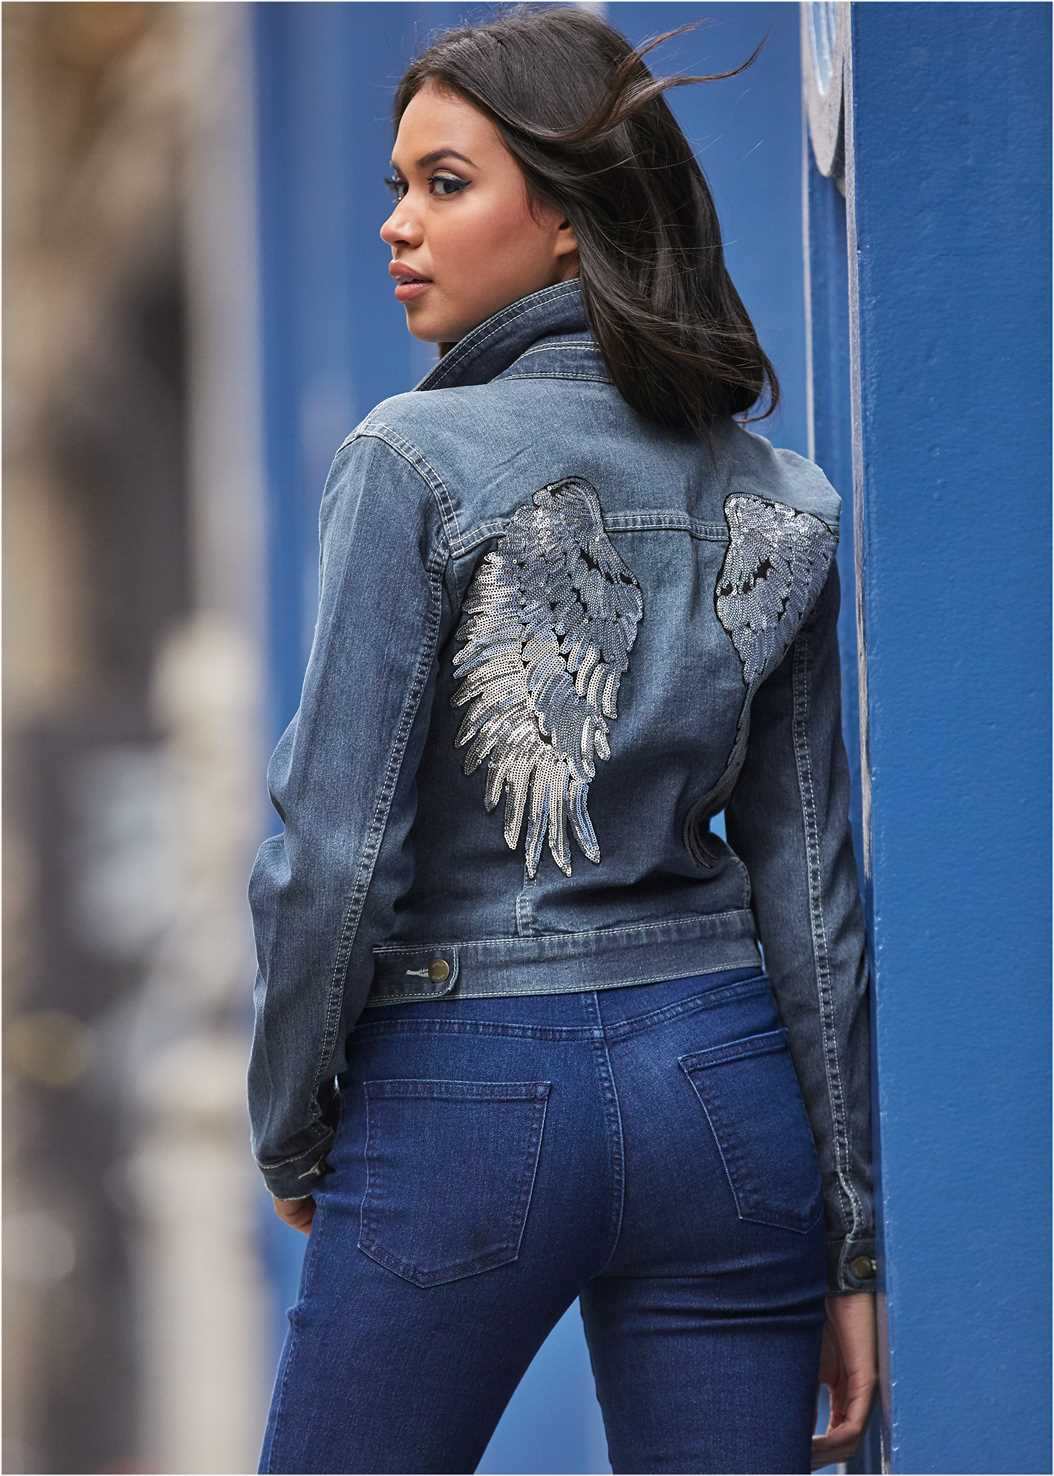 Sequin Detail Jean Jacket,Basic Cami Two Pack,Mid Rise Color Skinny Jeans,Studded Belt Bag